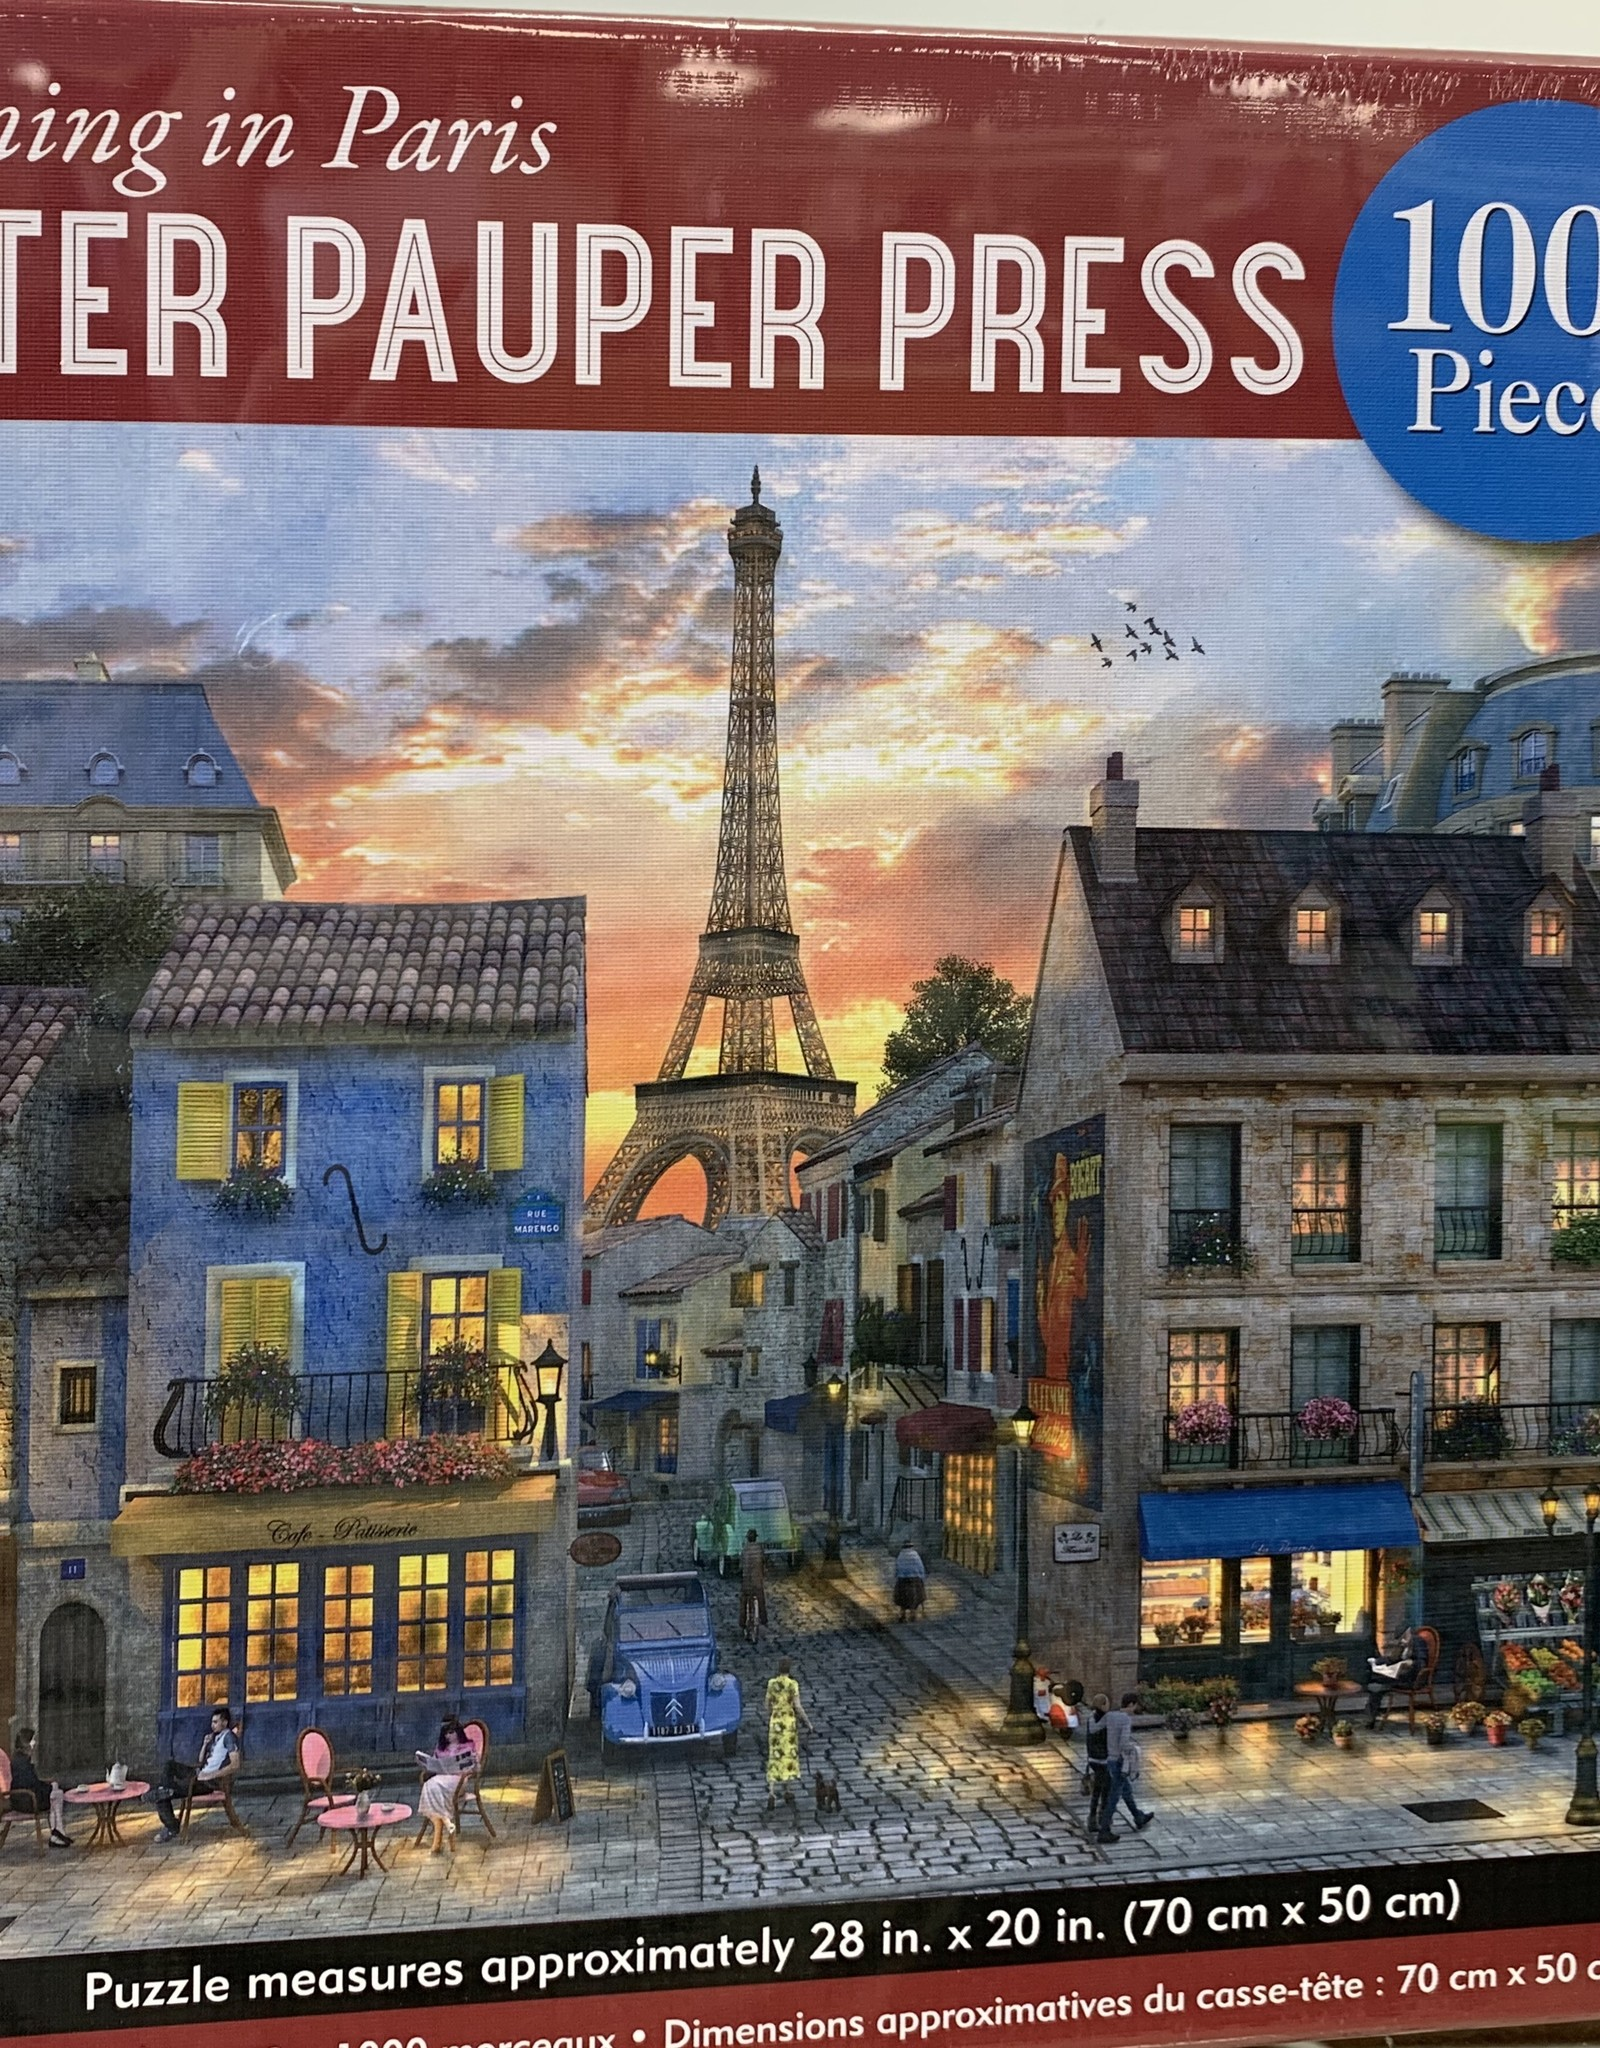 WHITE MOUNTAIN PUZZLES, INC. 1000 pc Reader's Paradise Puzzle